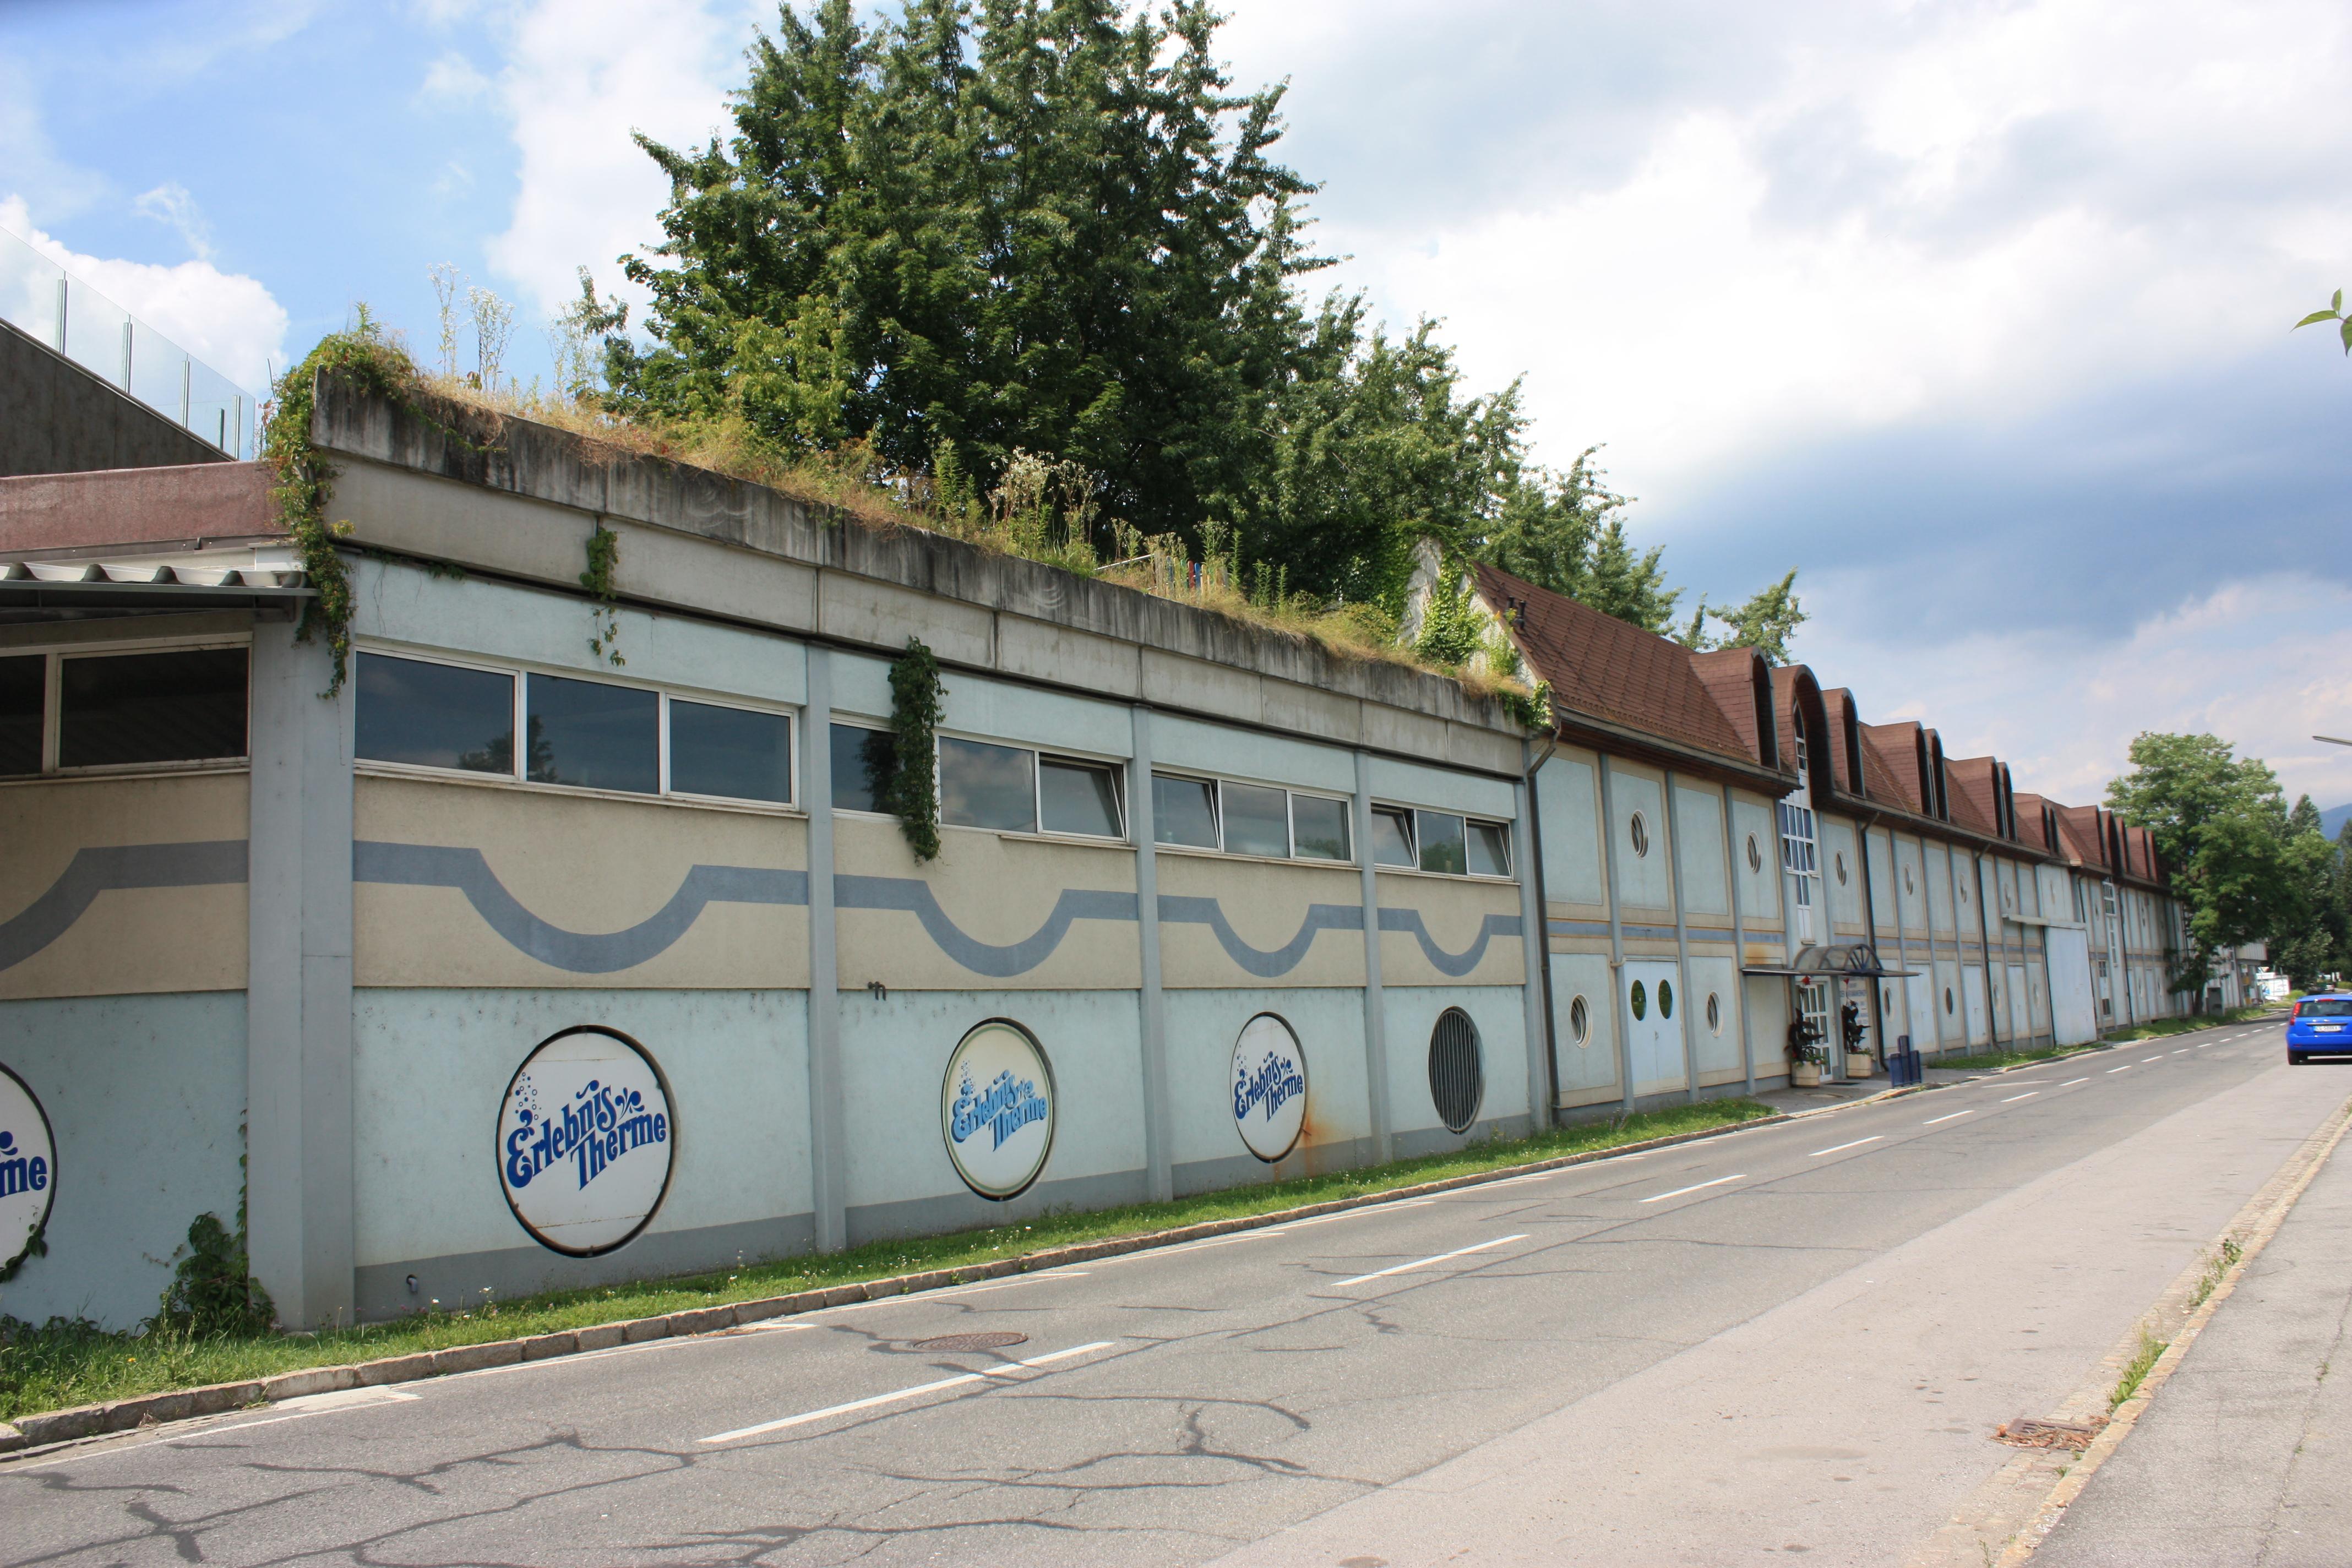 Erotik Warmbad-Judendorf (Villach) | Locanto Erotik Dating